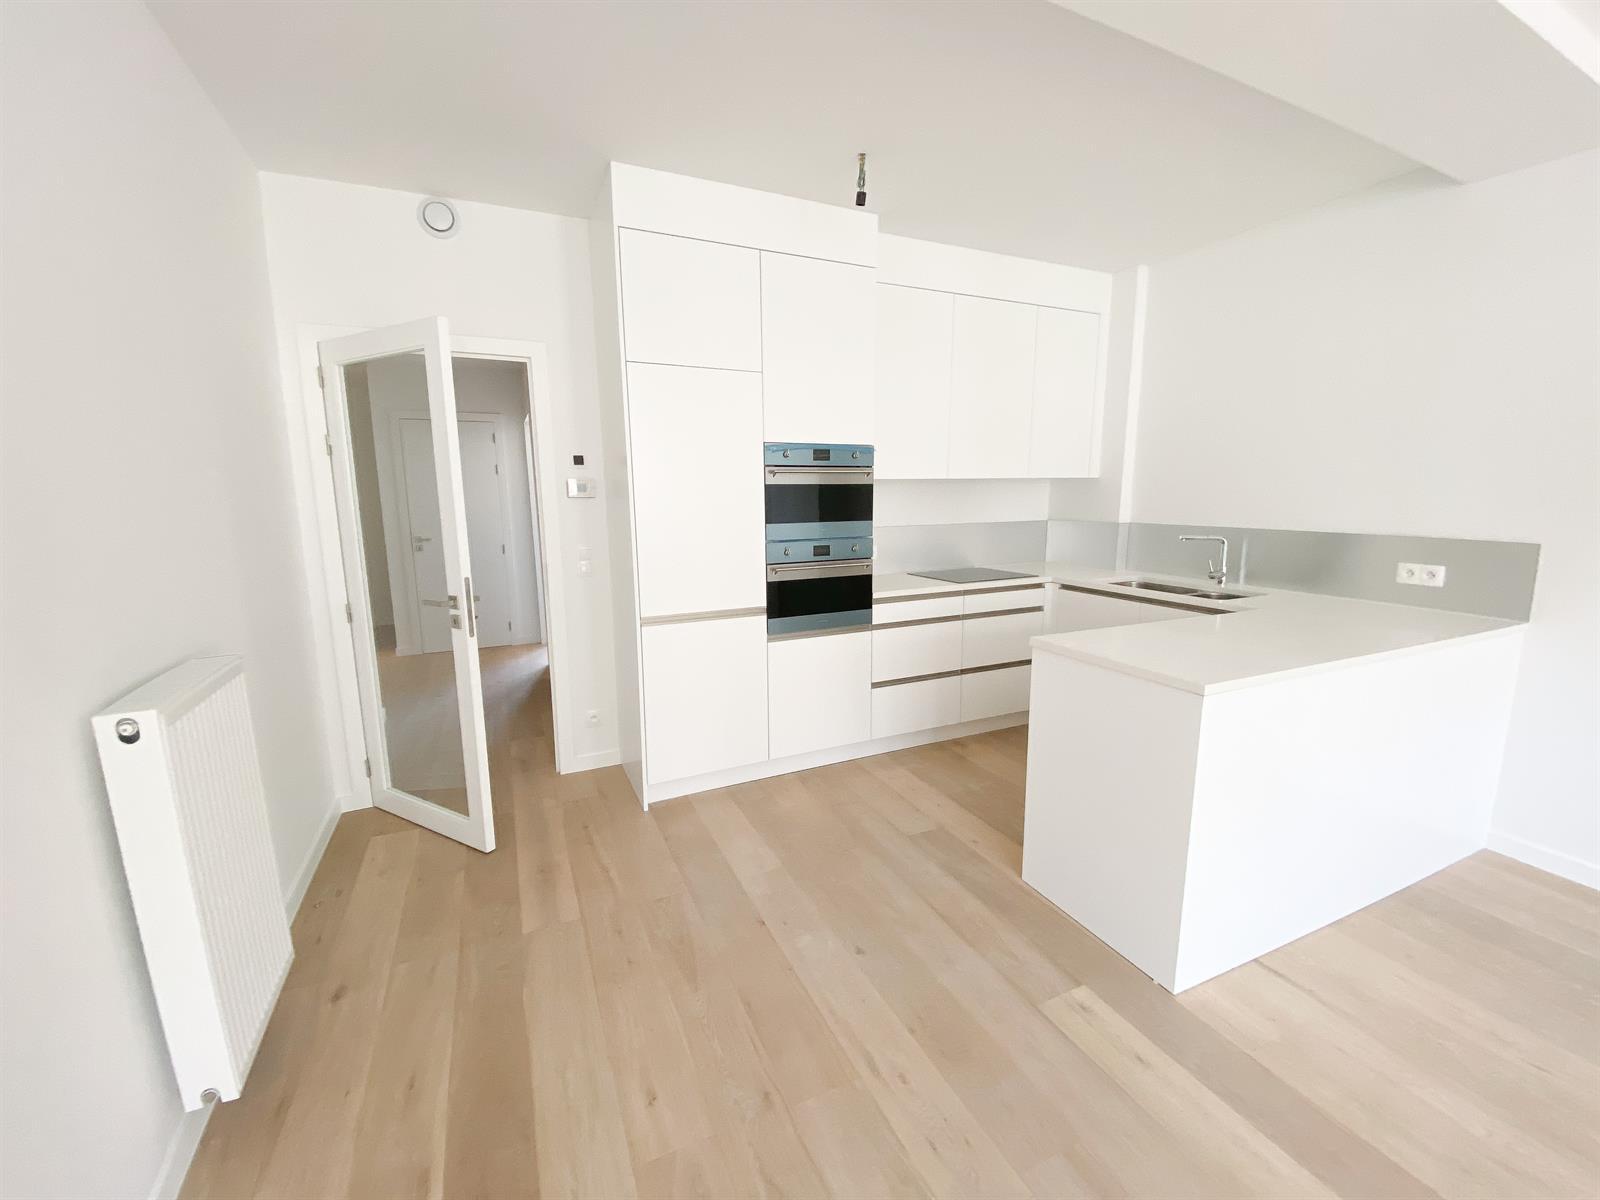 Duplex - Liège - #4045842-3